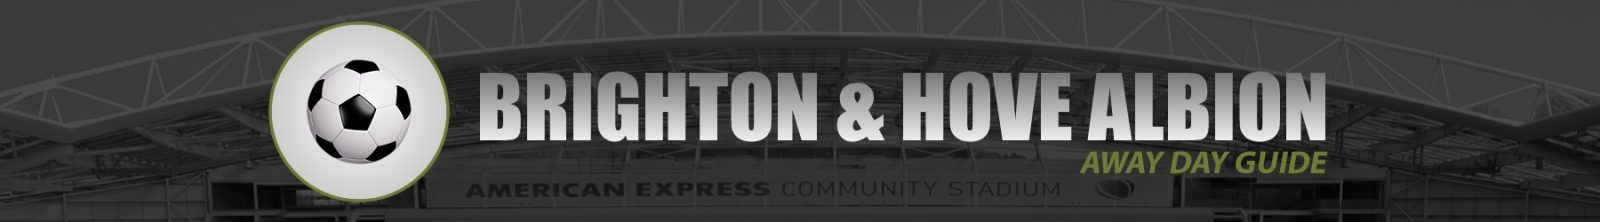 Brighton & Hove Albion Away